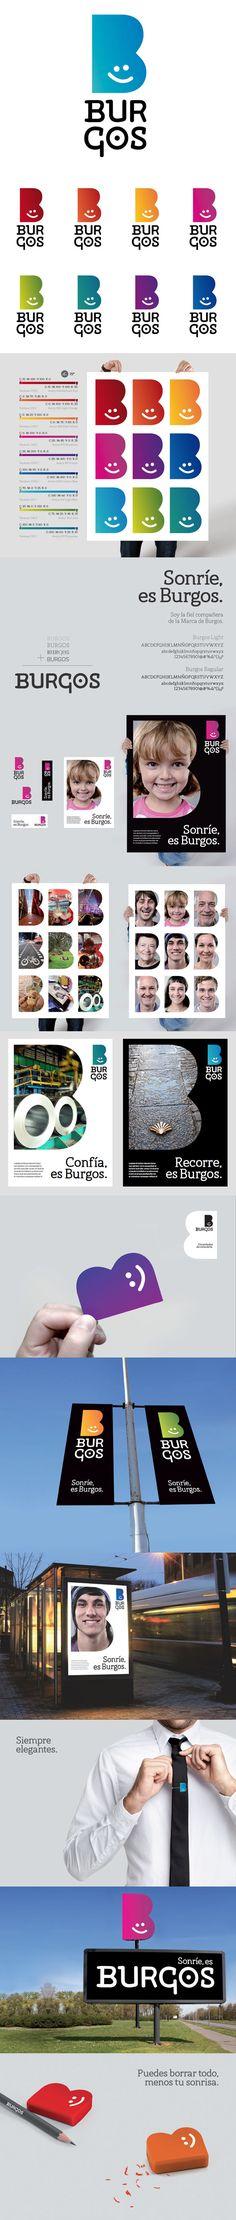 Identity for Burgos, Spain #city_brand 2012